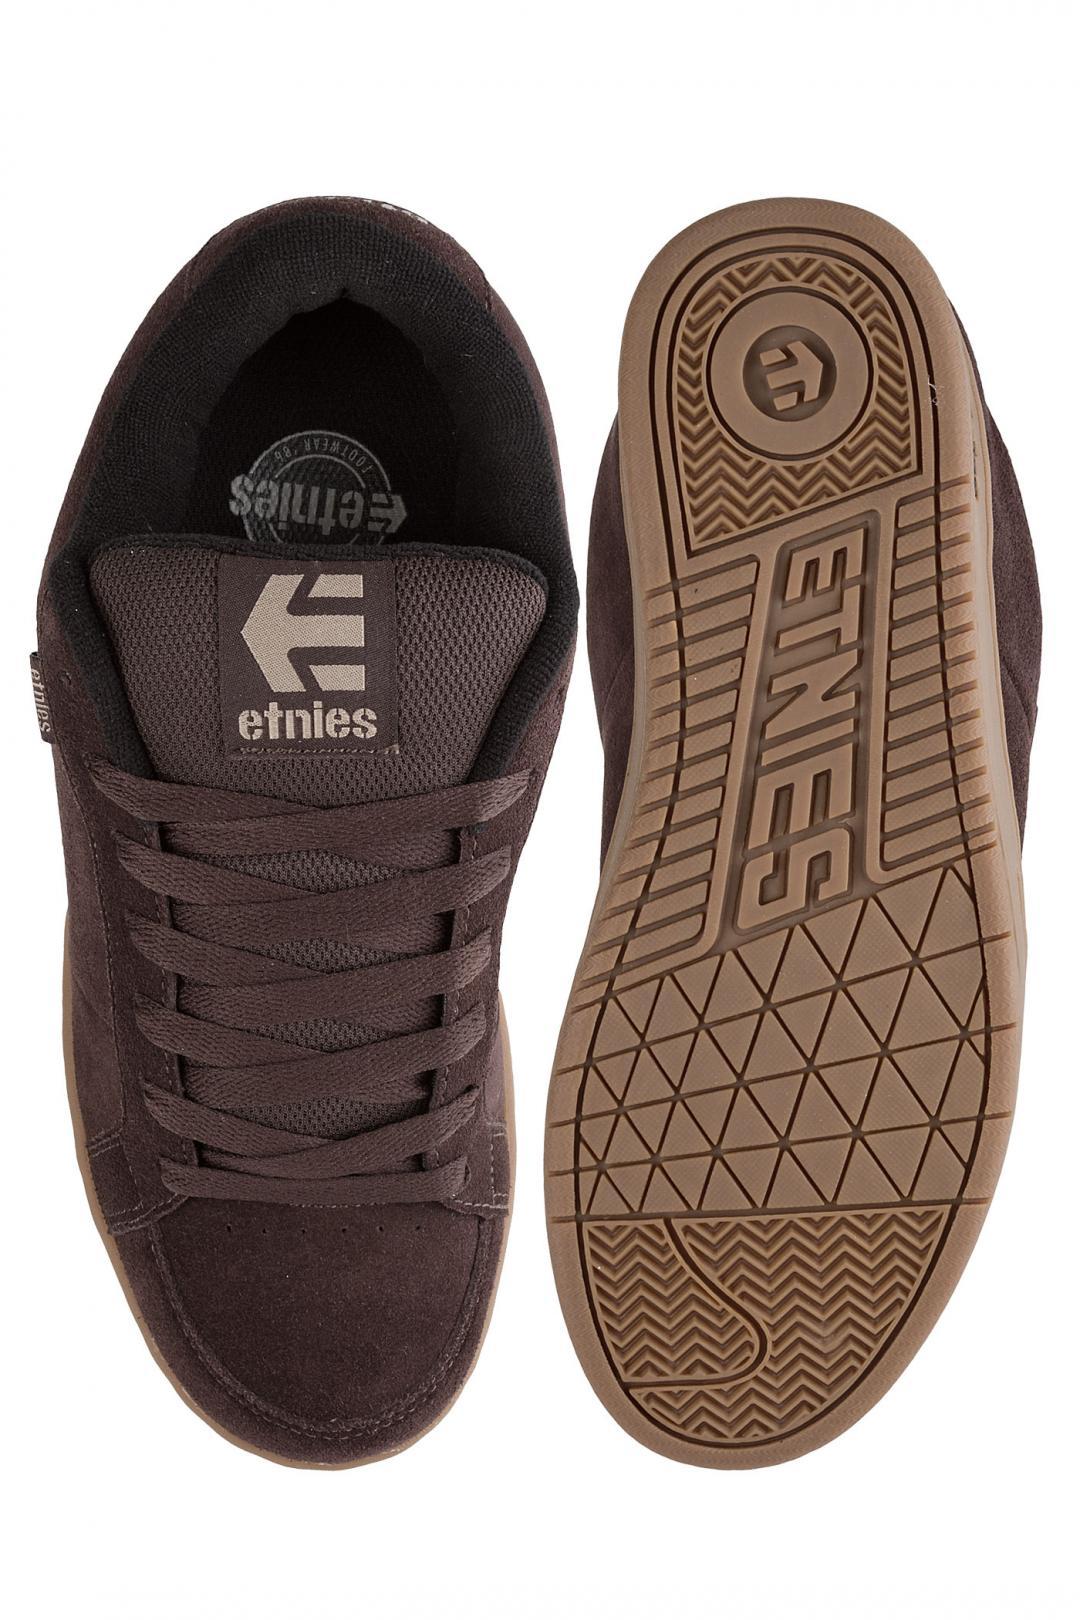 Uomo Etnies Kingpin brown black gum | Sneaker